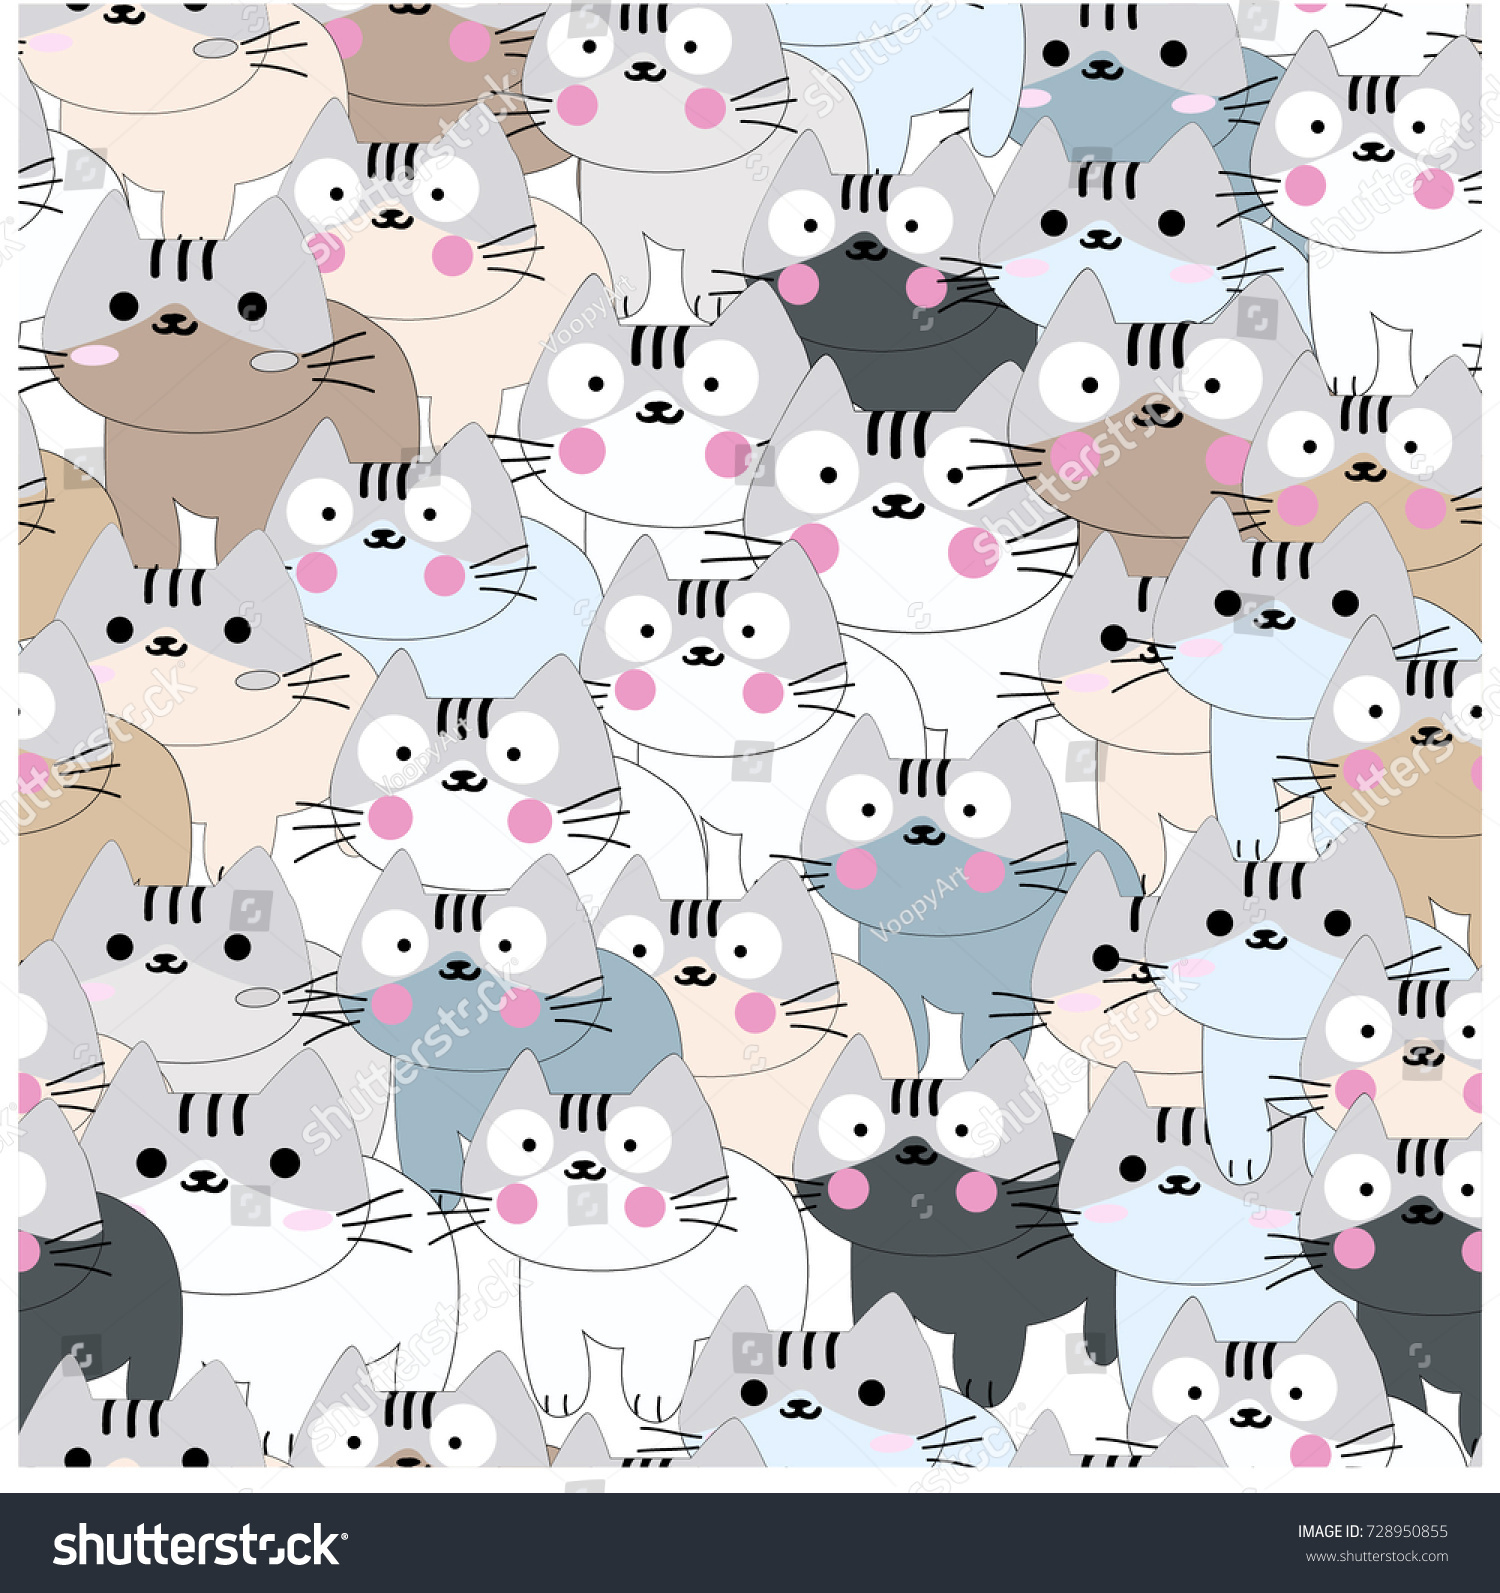 Cat Wallpaper Pastel